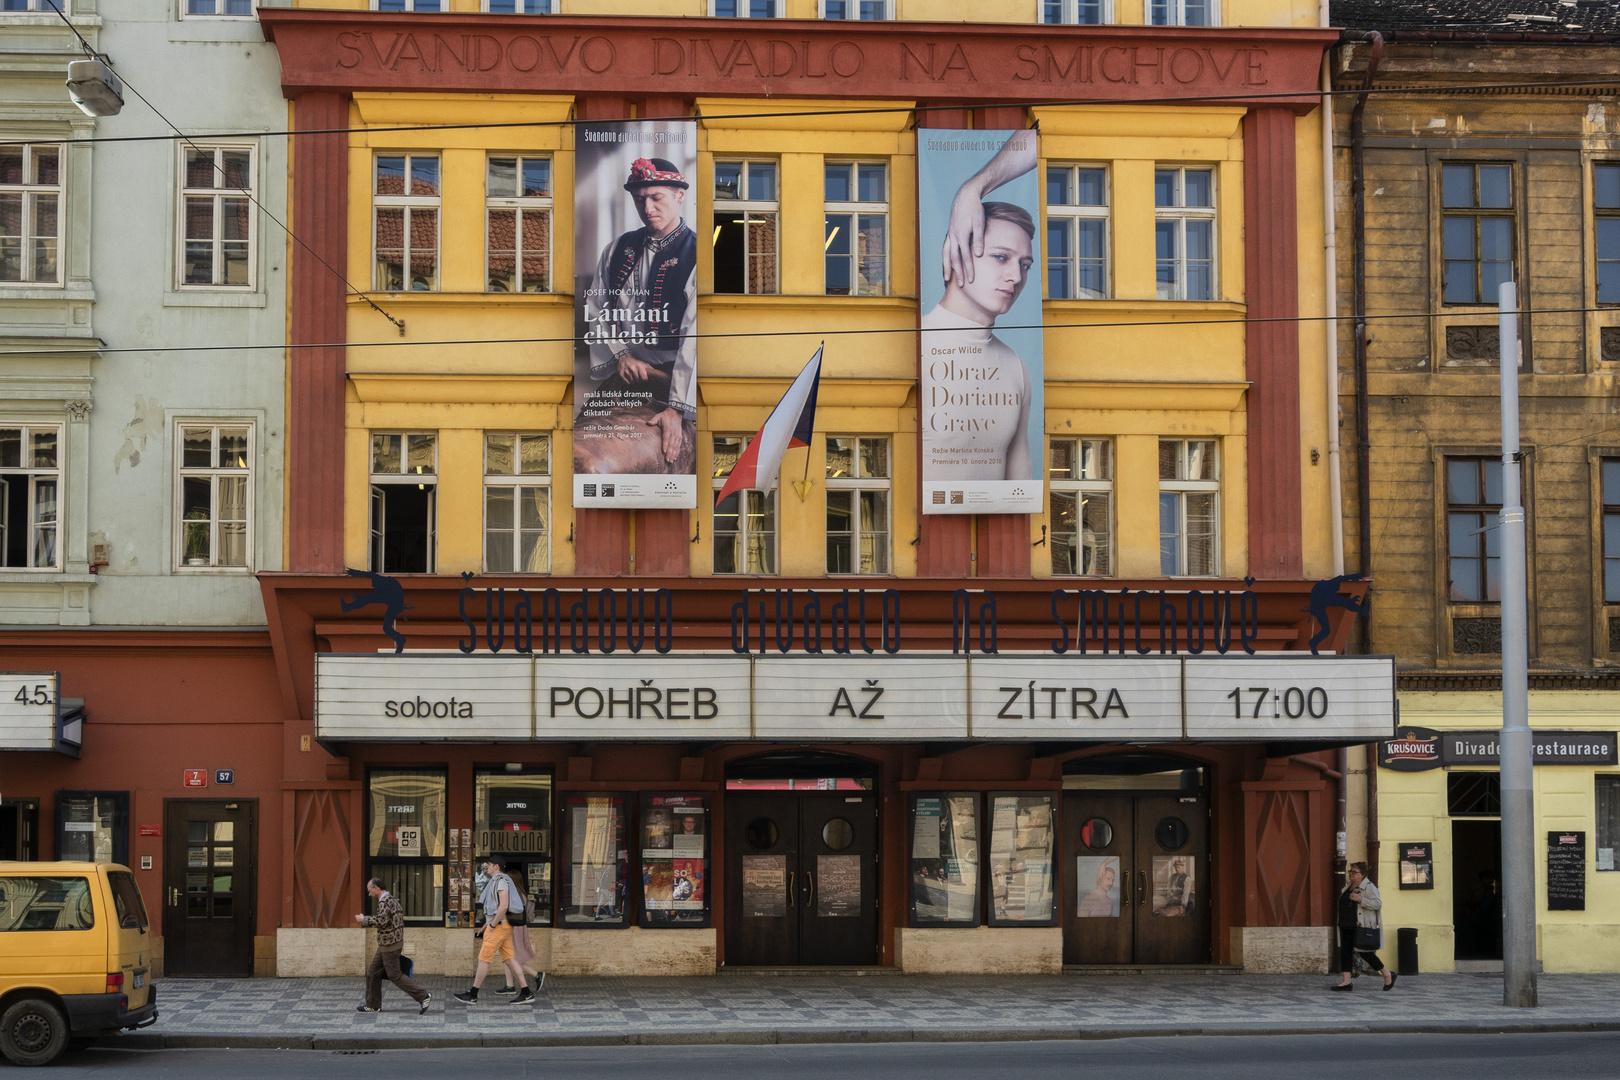 Praga, Teatro Svandovo Divadlo, Quartiere Smichov